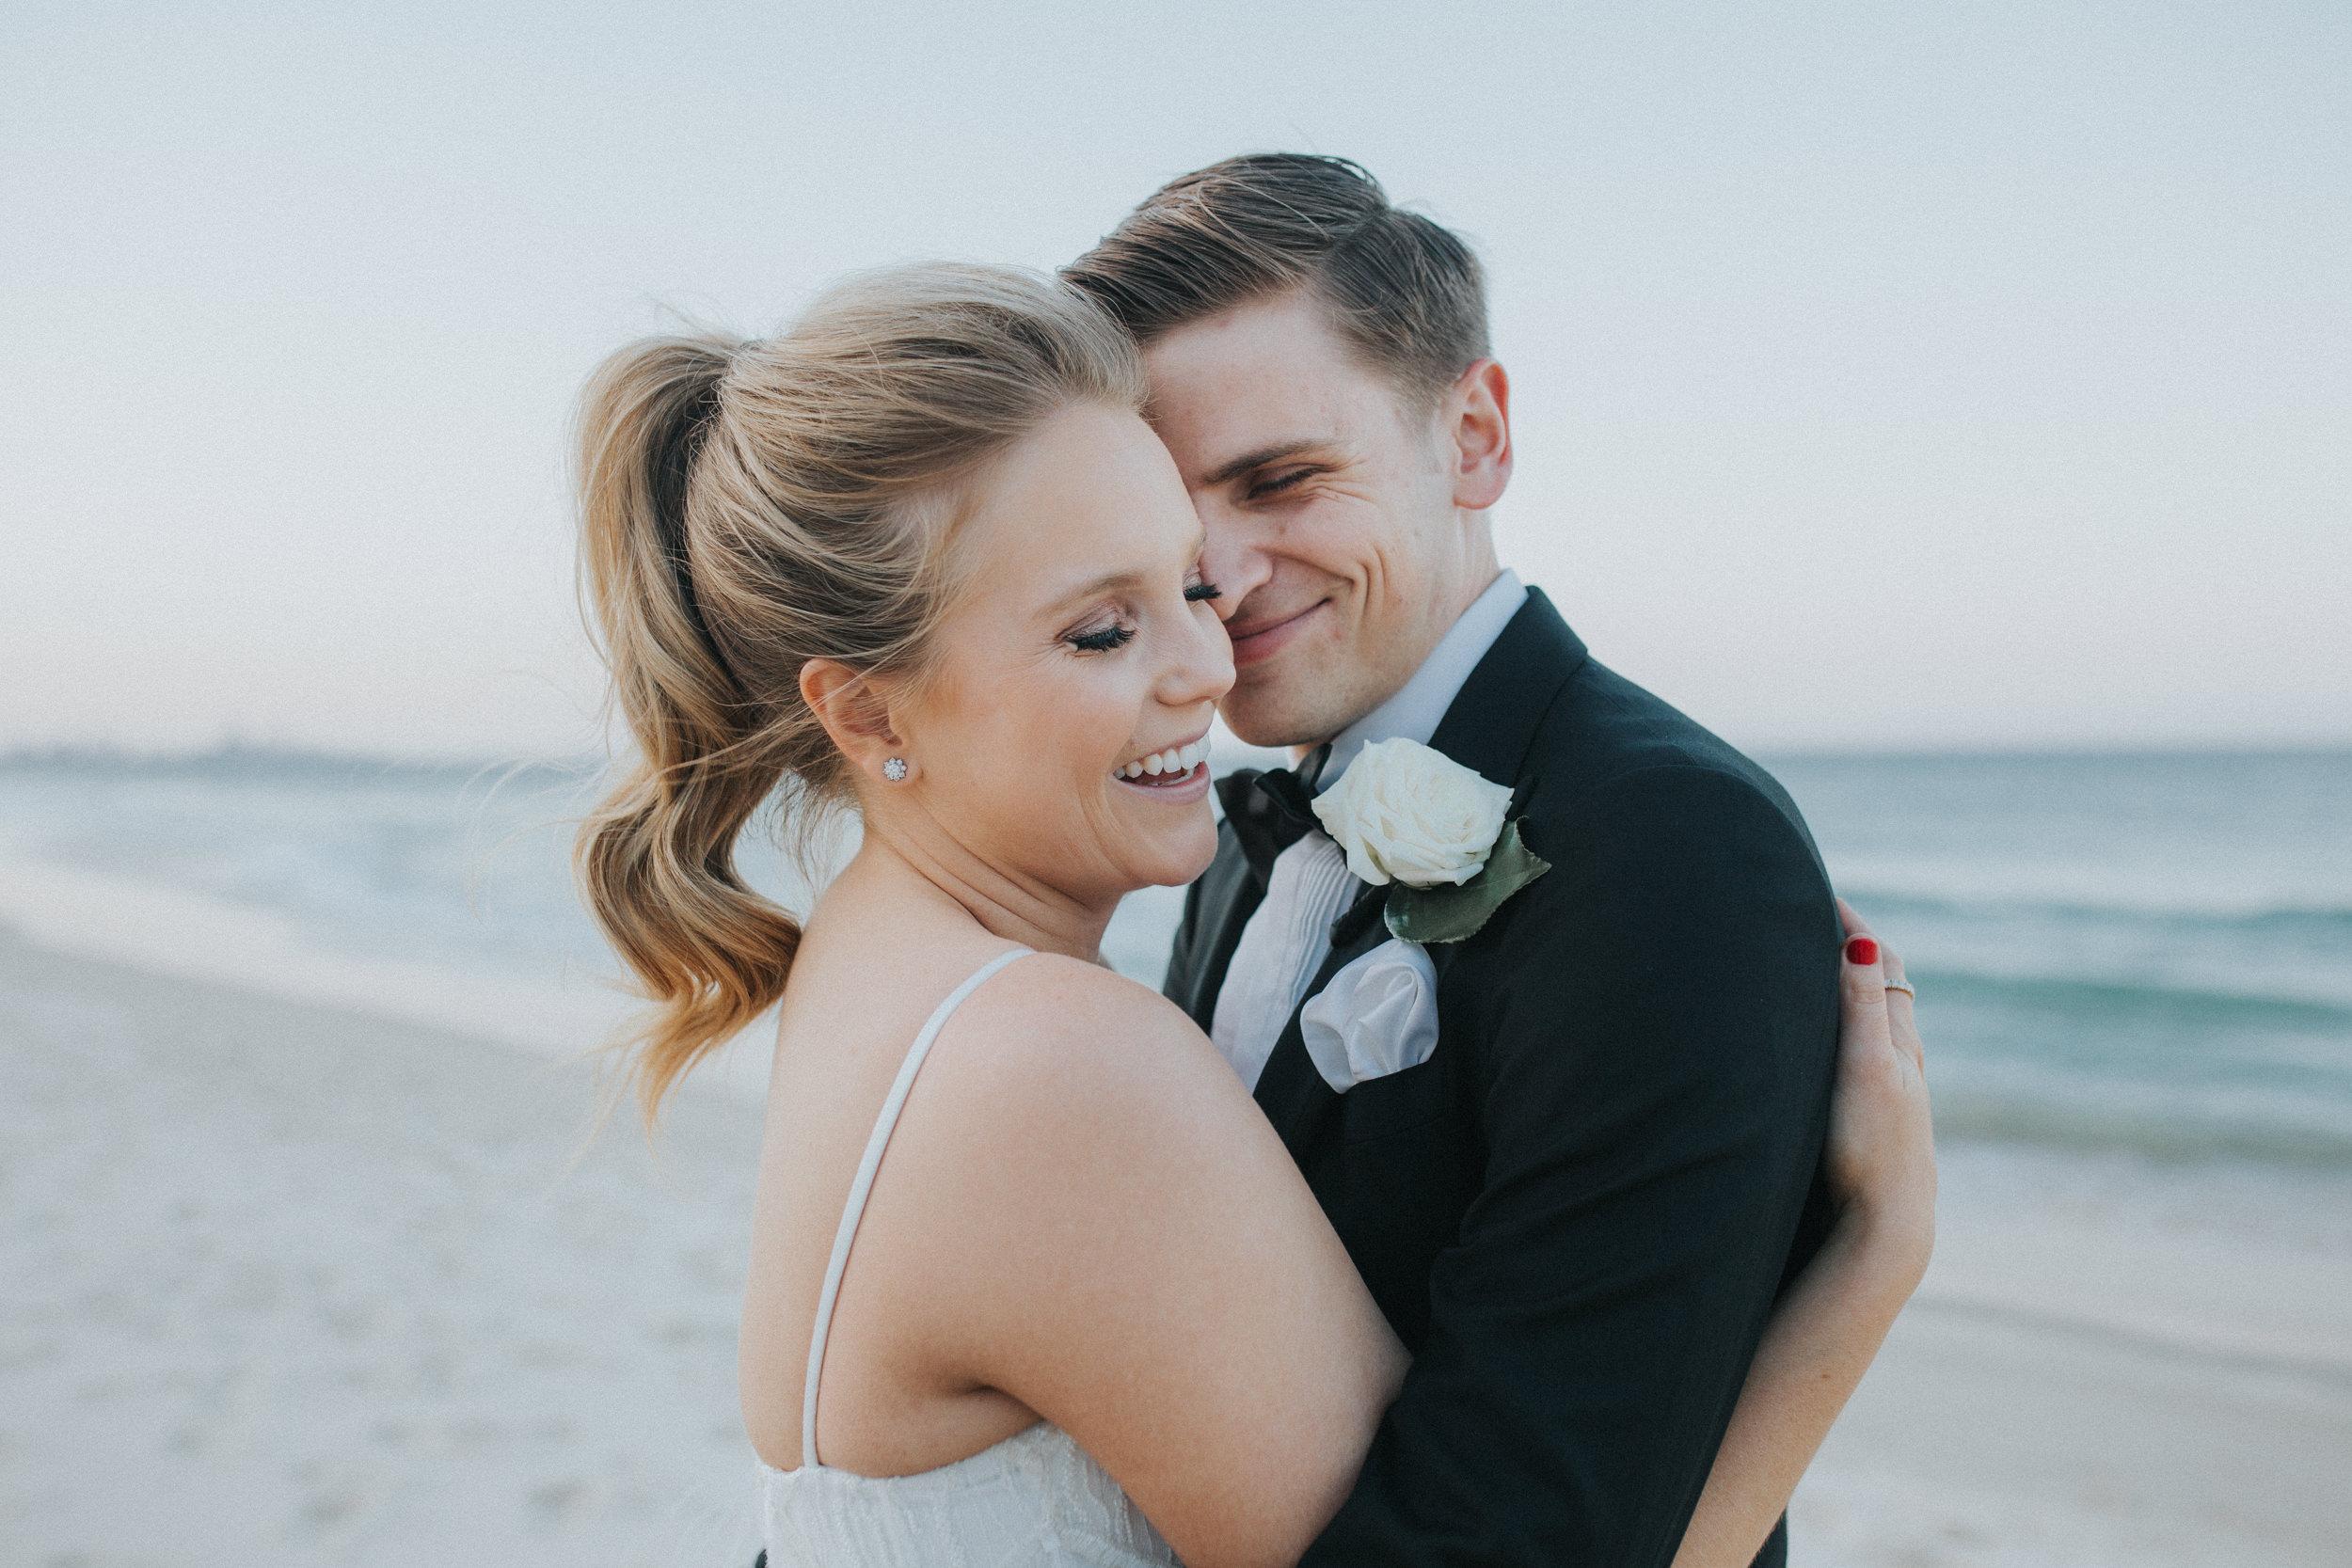 Natalie + Jake - Burleigh heads wedding